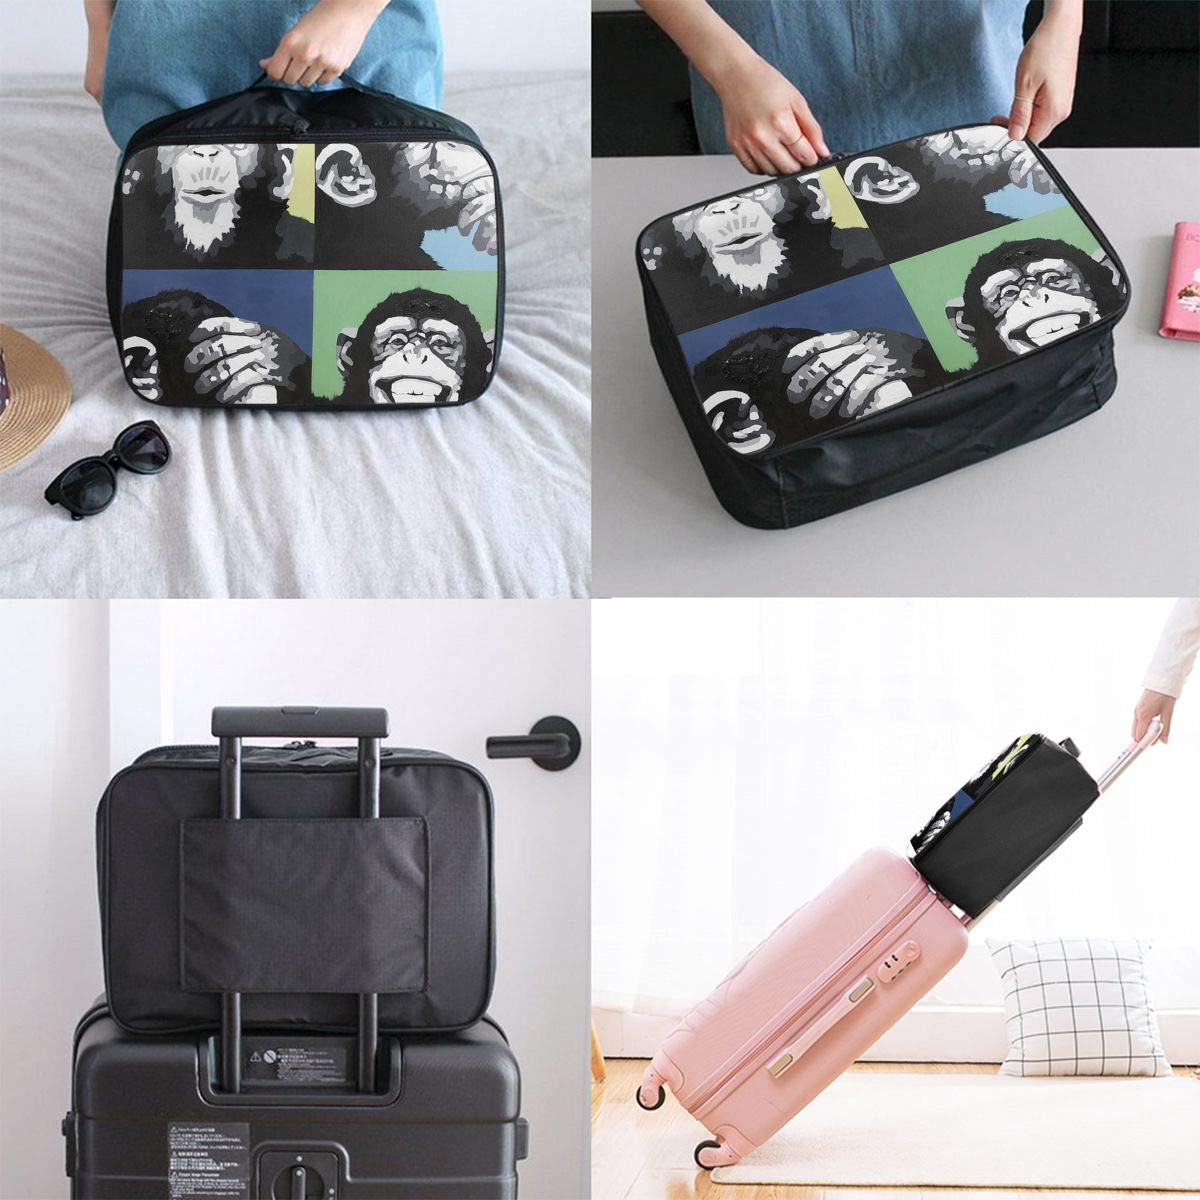 Travel Luggage Duffle Bag Lightweight Portable Handbag Animals Chimpanzee Print Large Capacity Waterproof Foldable Storage Tote